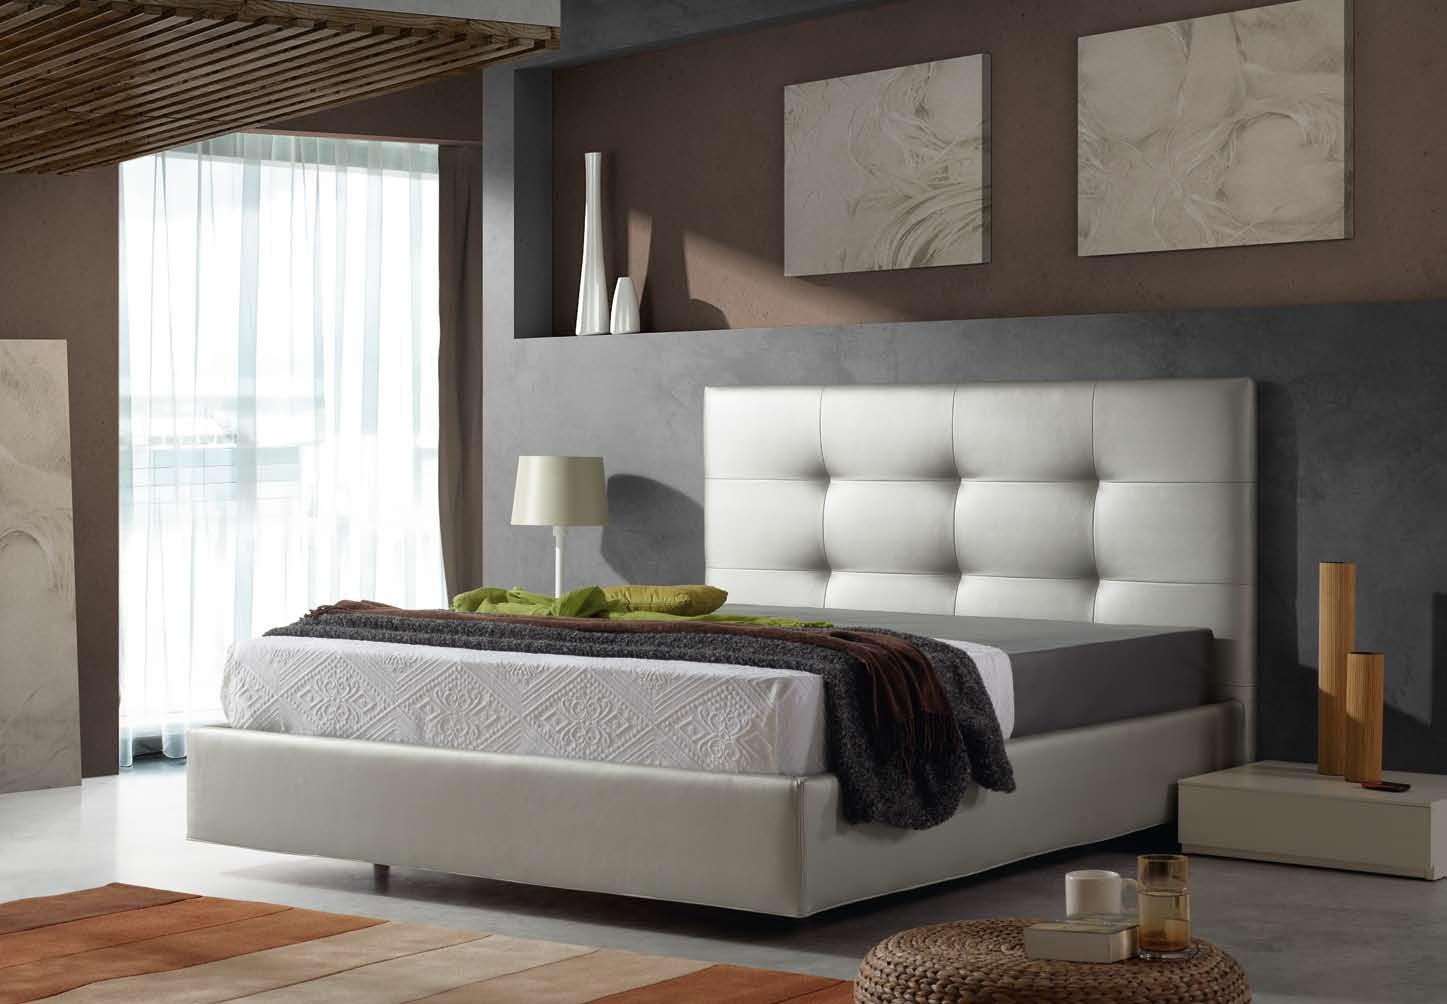 Dormitorios Con Cabeceros Tapizados Camas Tapizadas